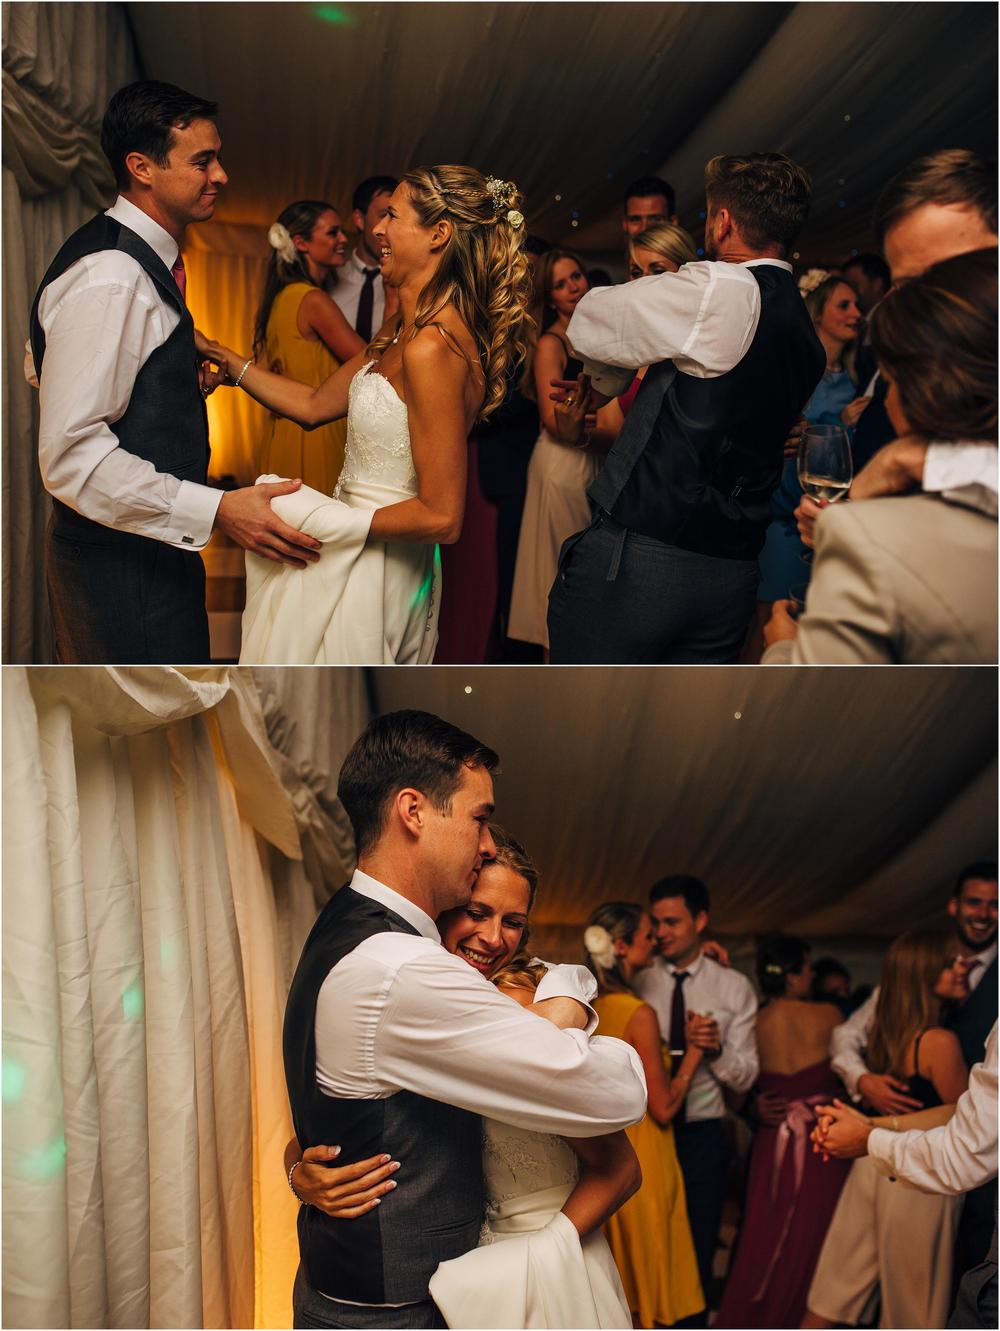 somerset wedding photographer_0058.jpg